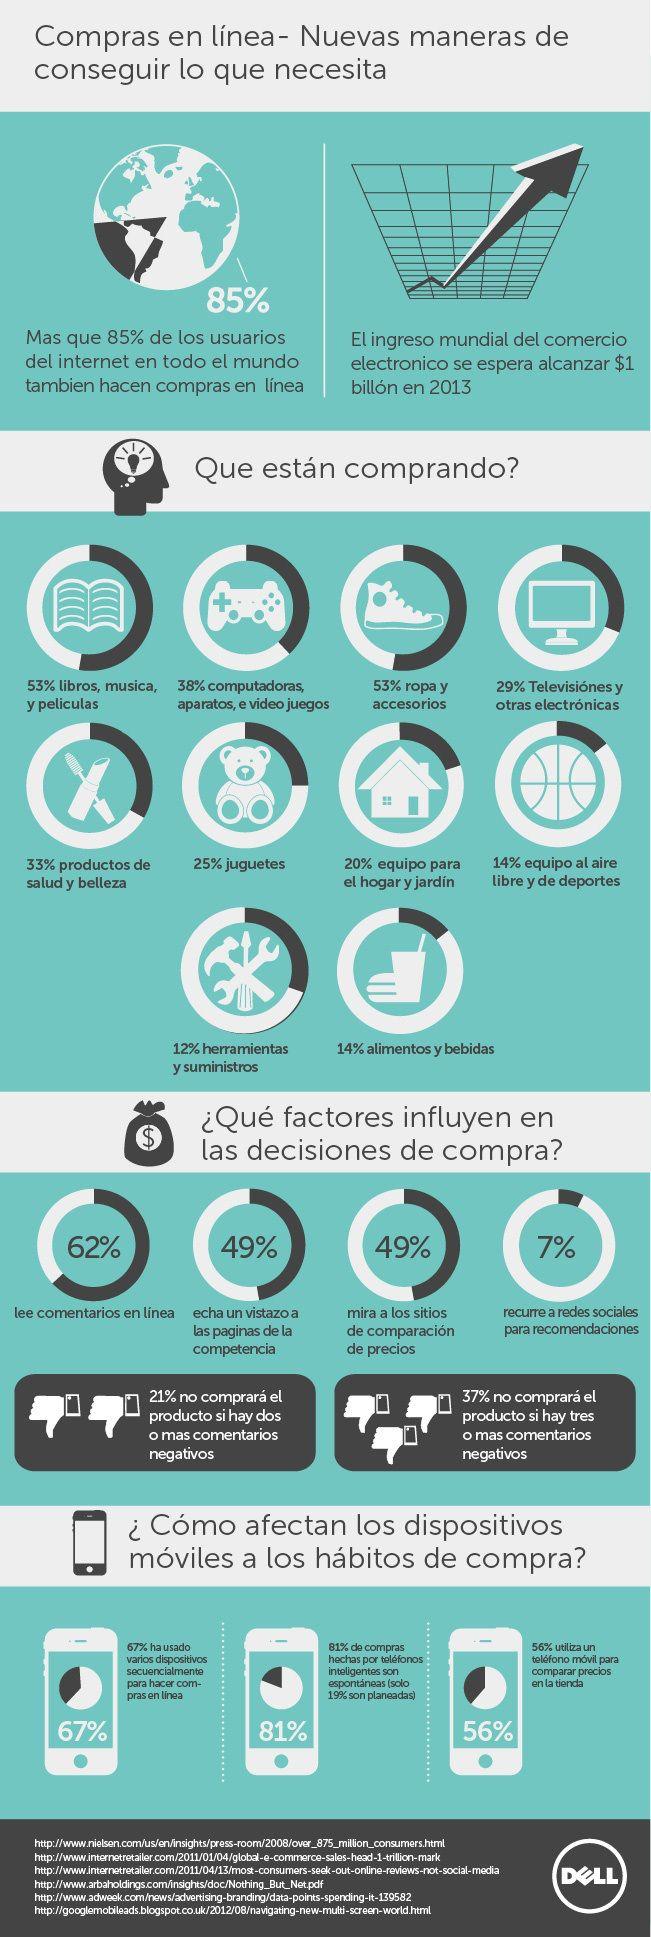 Tienda online #infografia #infographic #ecommerce